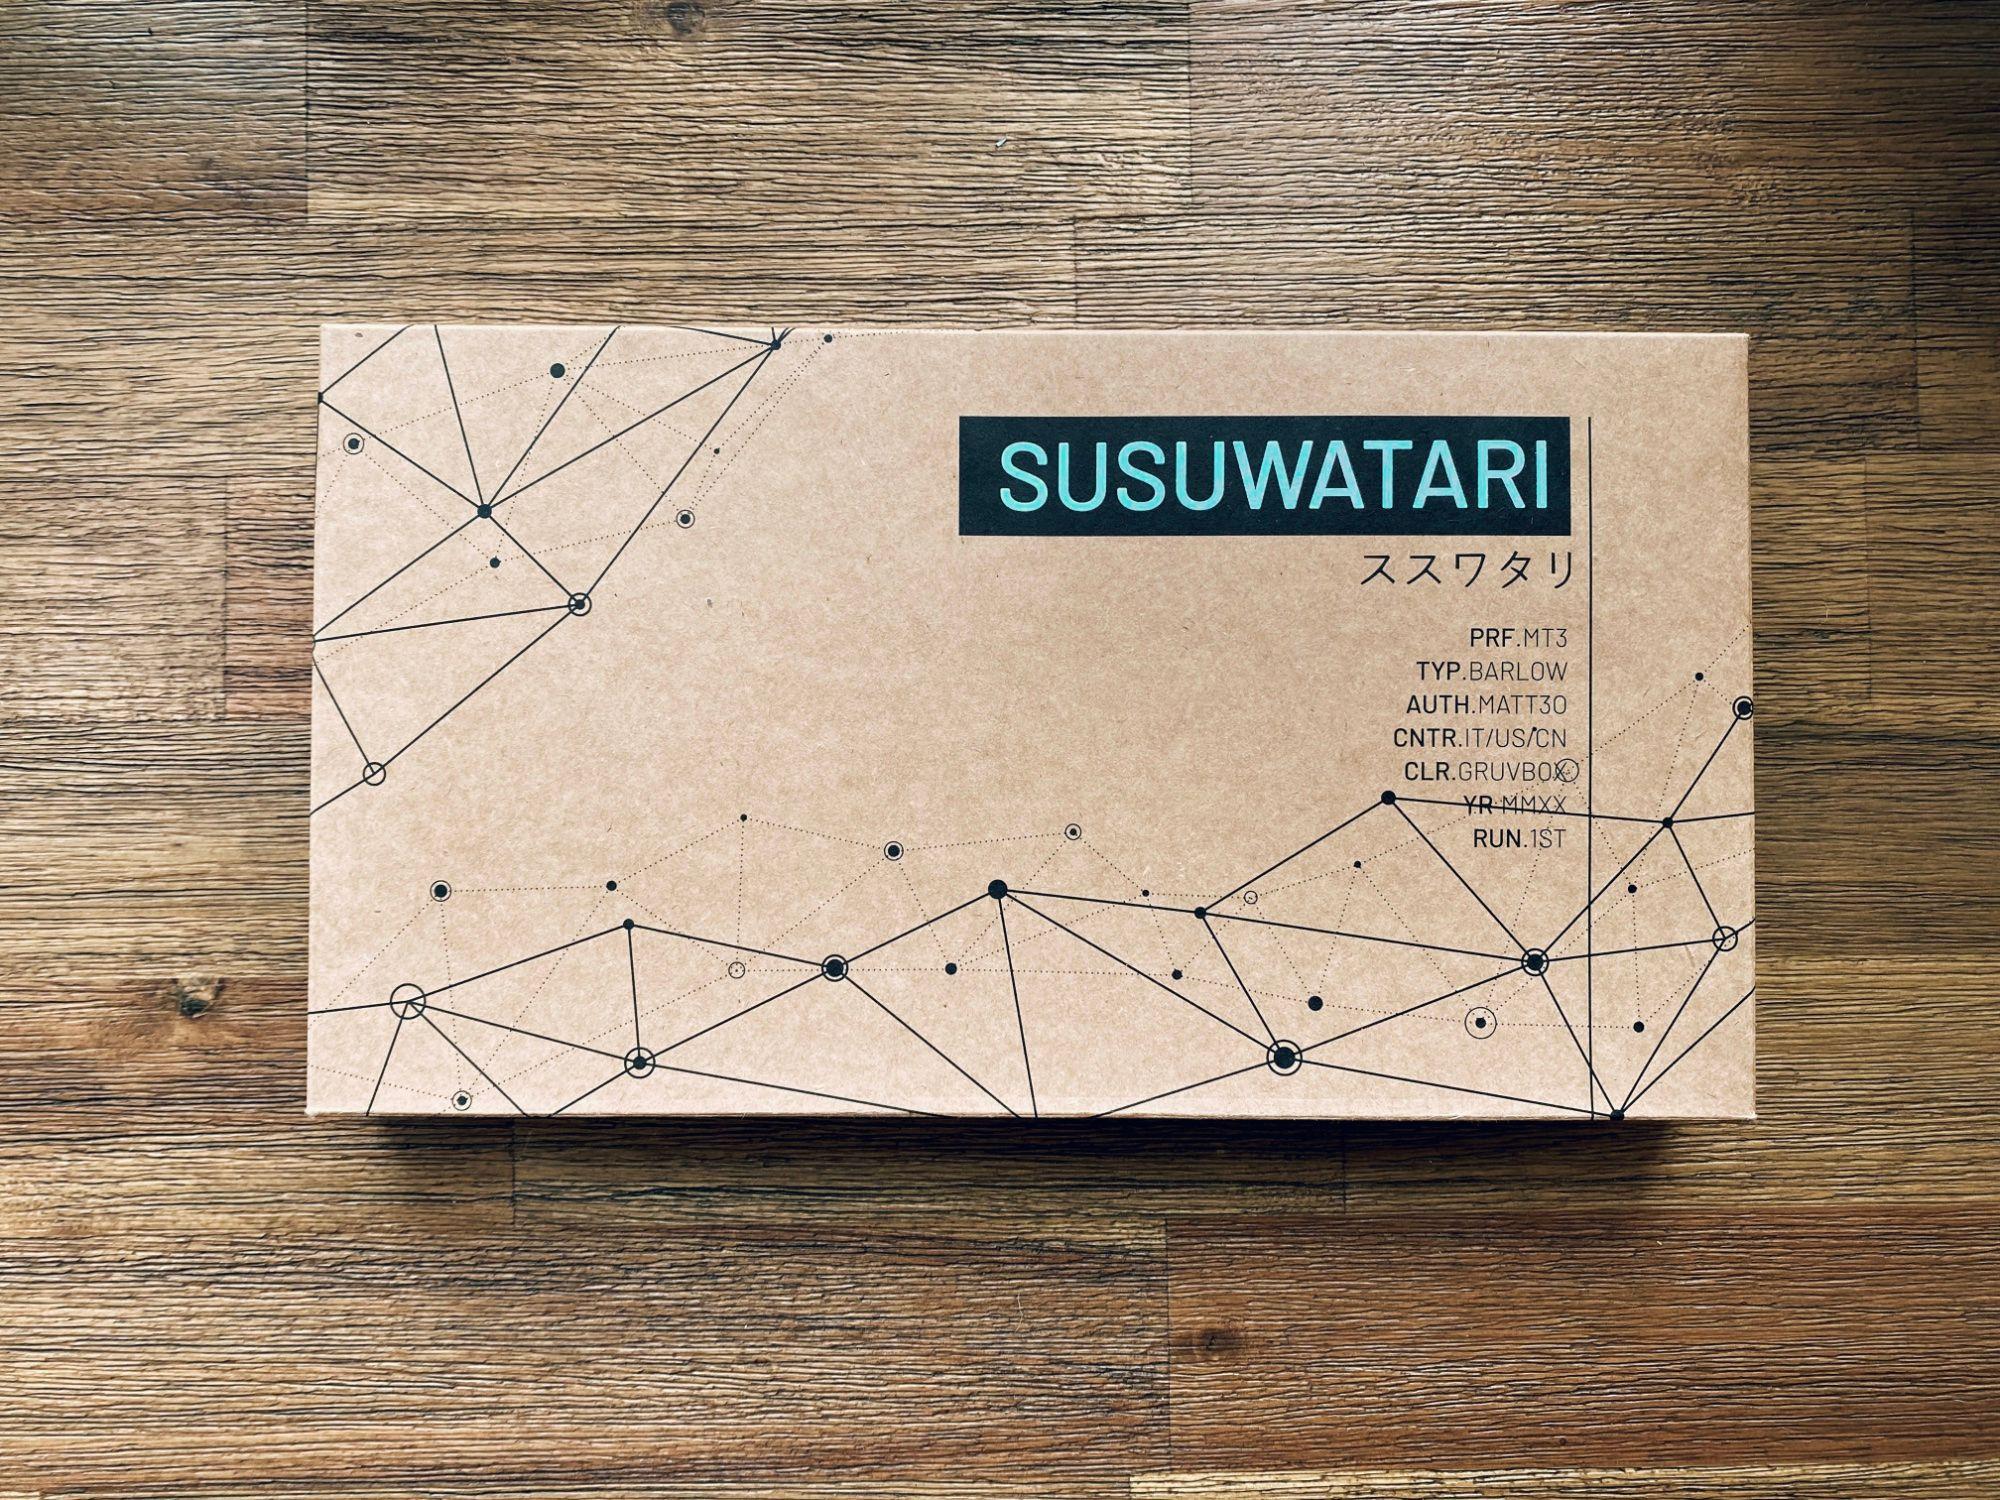 Drop + Matt3o MT3 Susuwatari Custom Keycap Set box